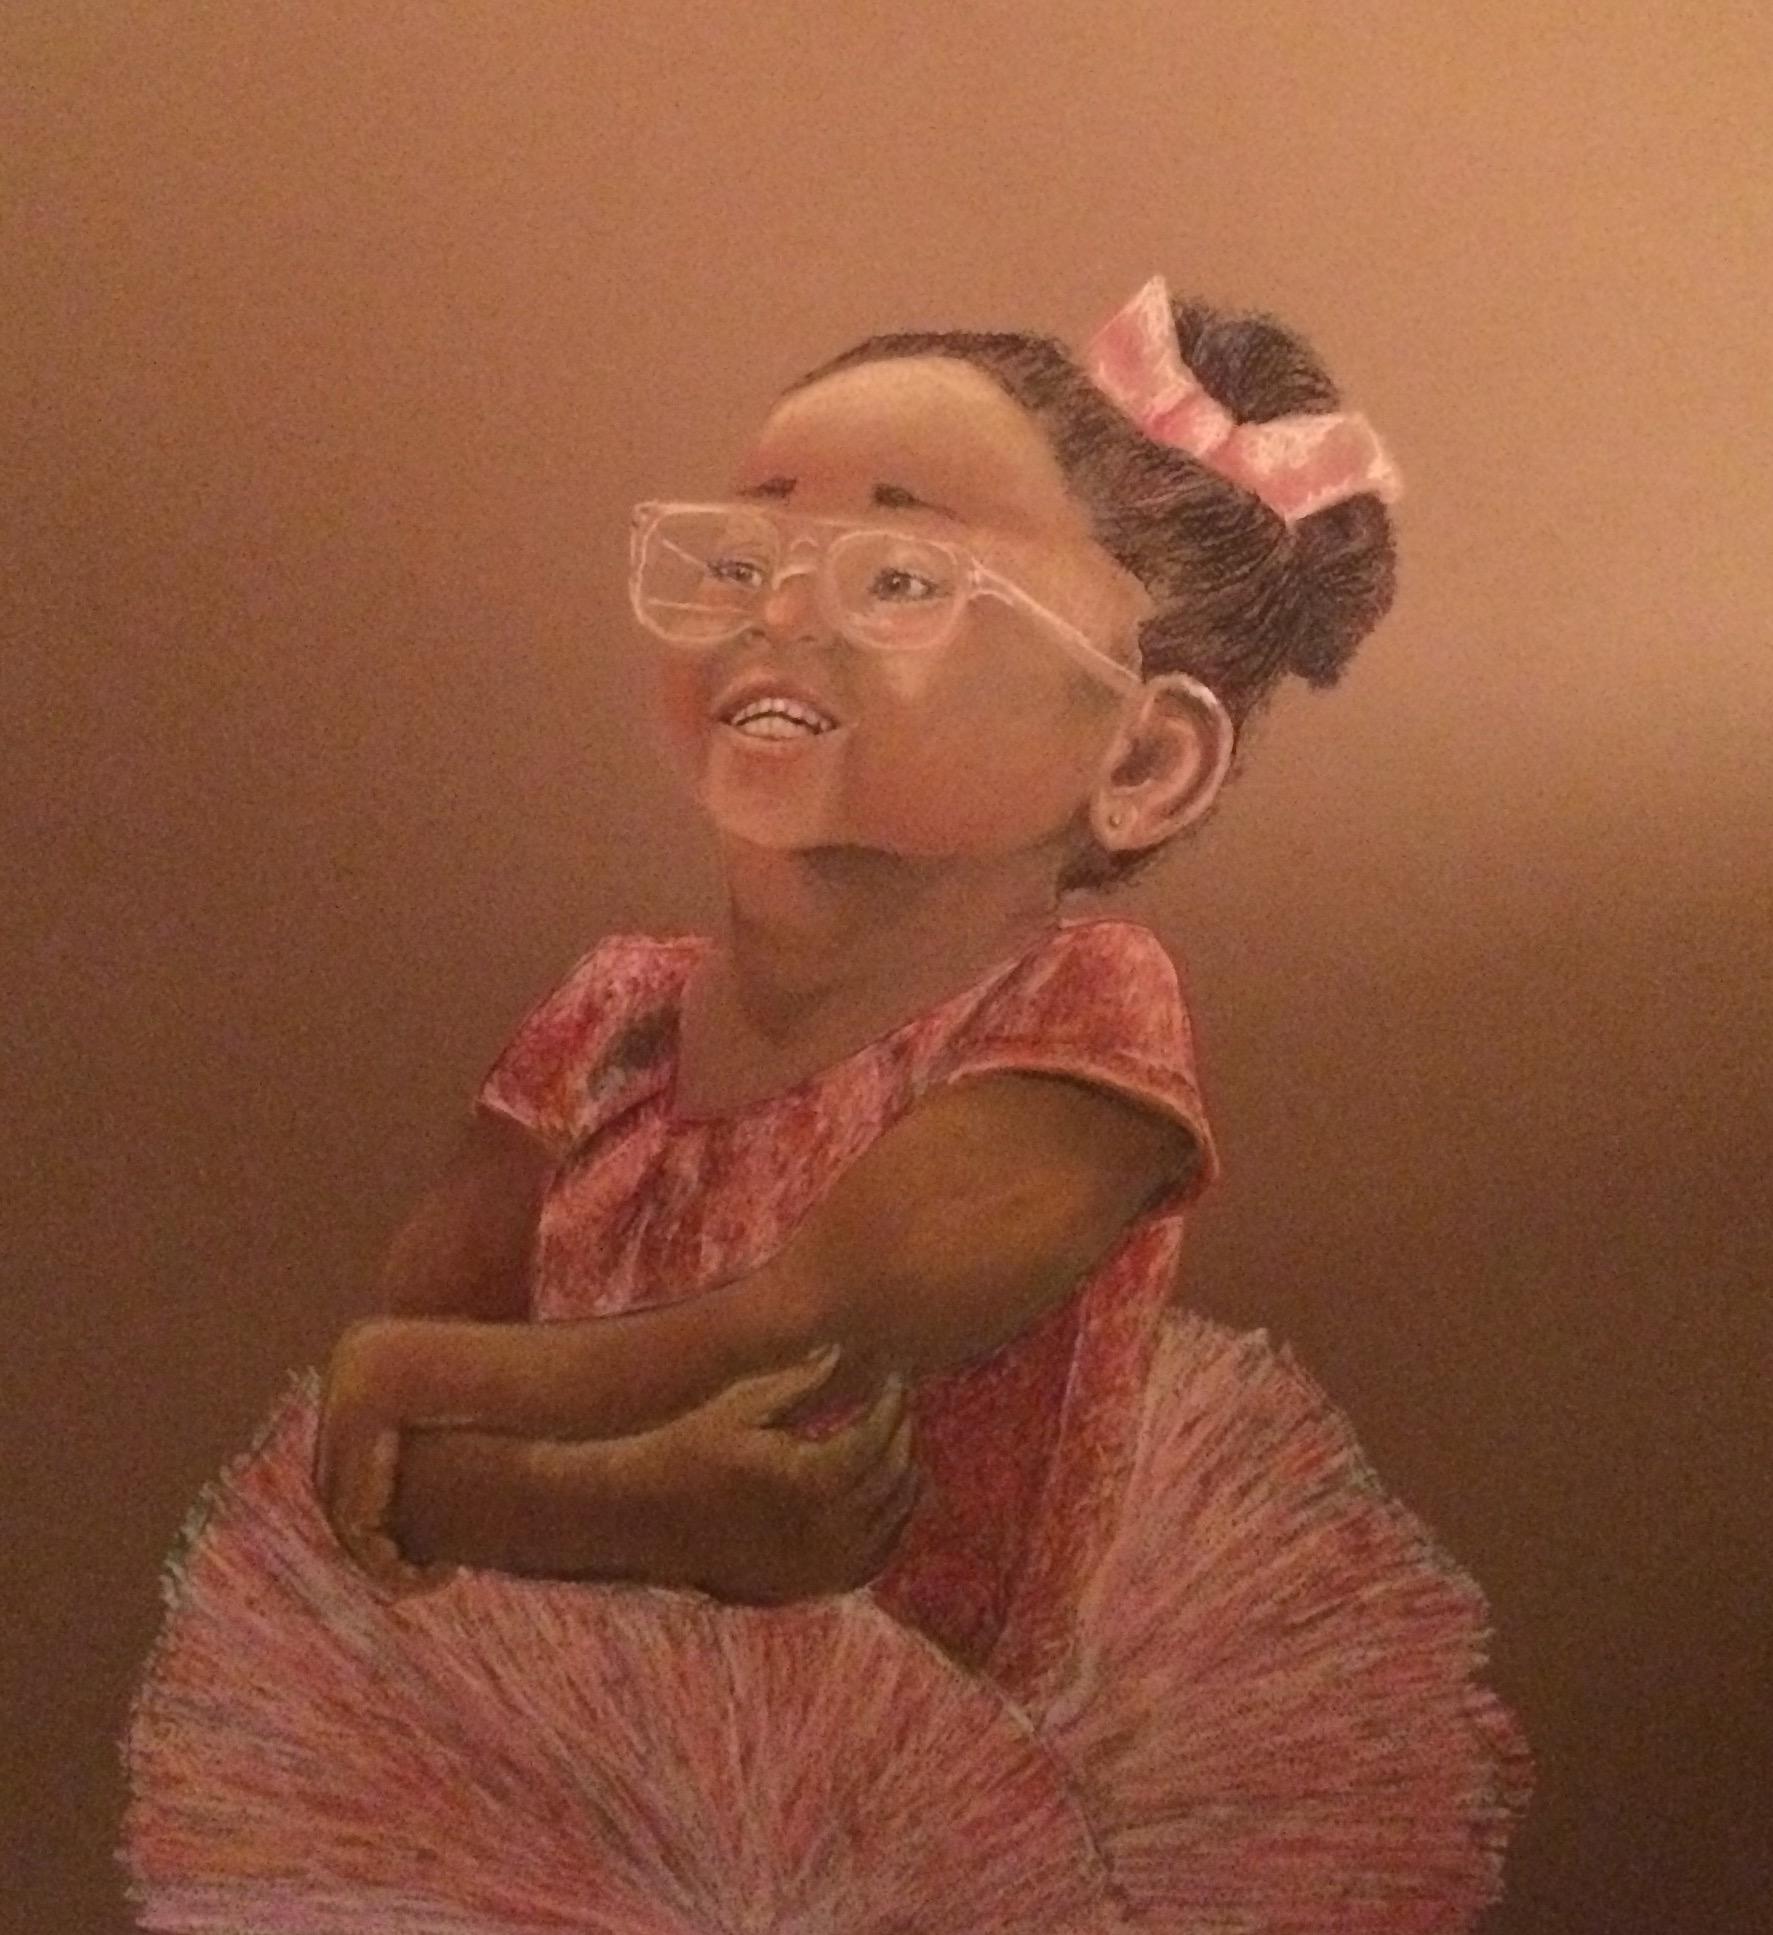 ballerina baby.jpg